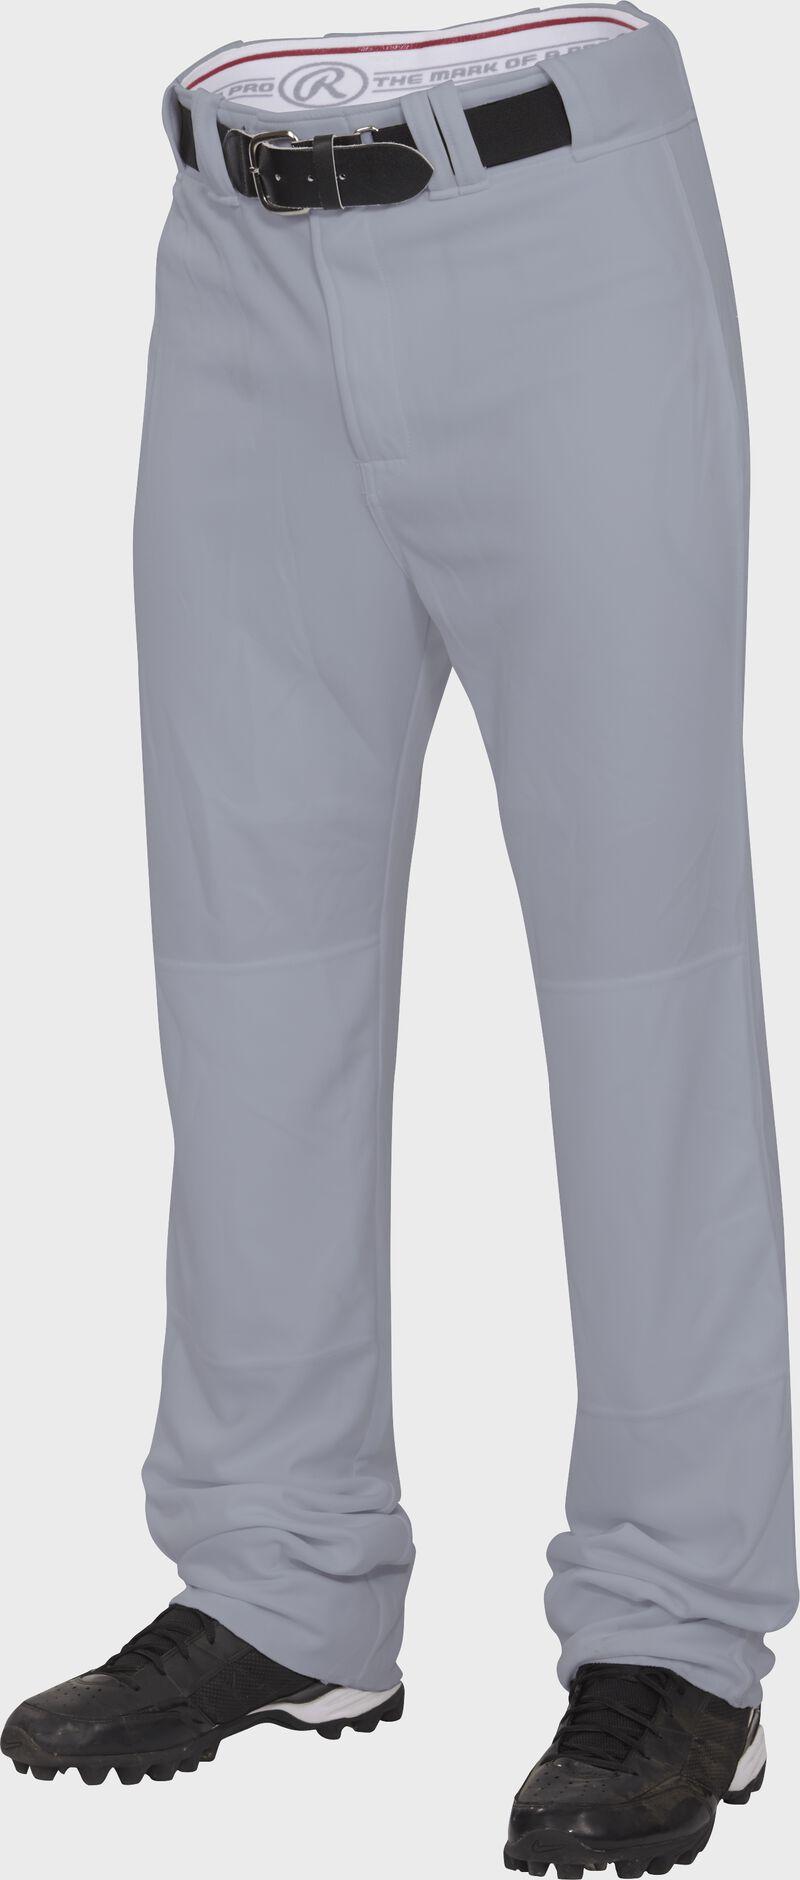 Front of Rawlings Blue Gray Adult Premium Straight Pant - SKU #BPU150-BG